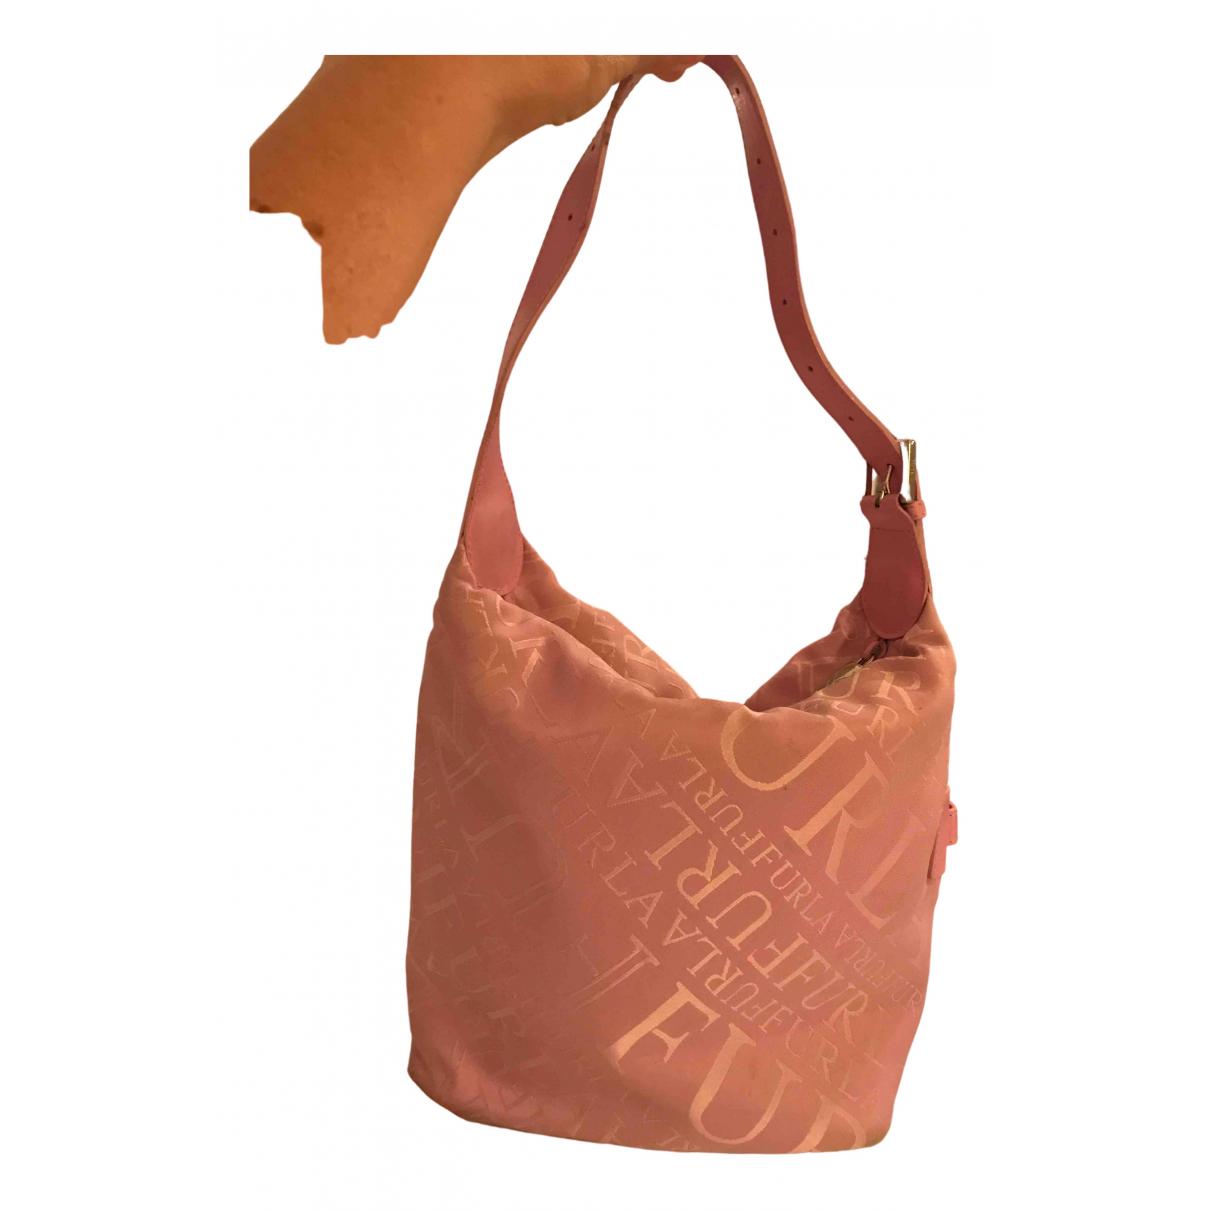 Furla \N Pink handbag for Women \N